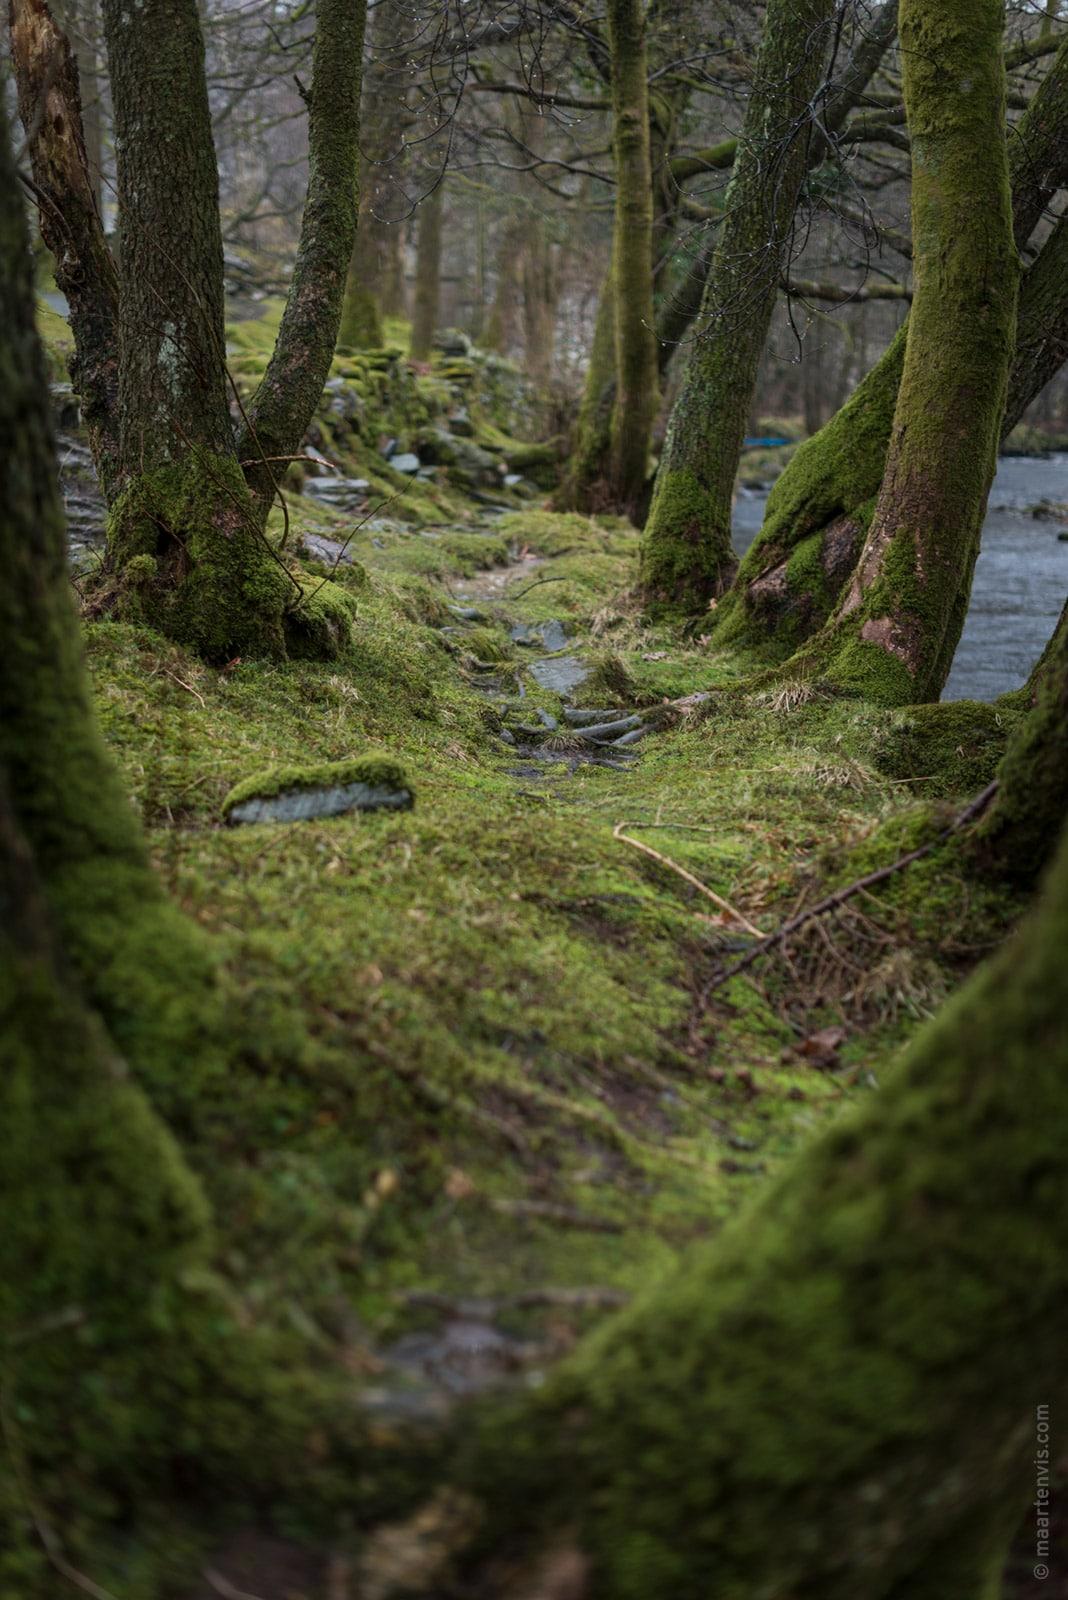 20160326 8423 - Lake District Impressions